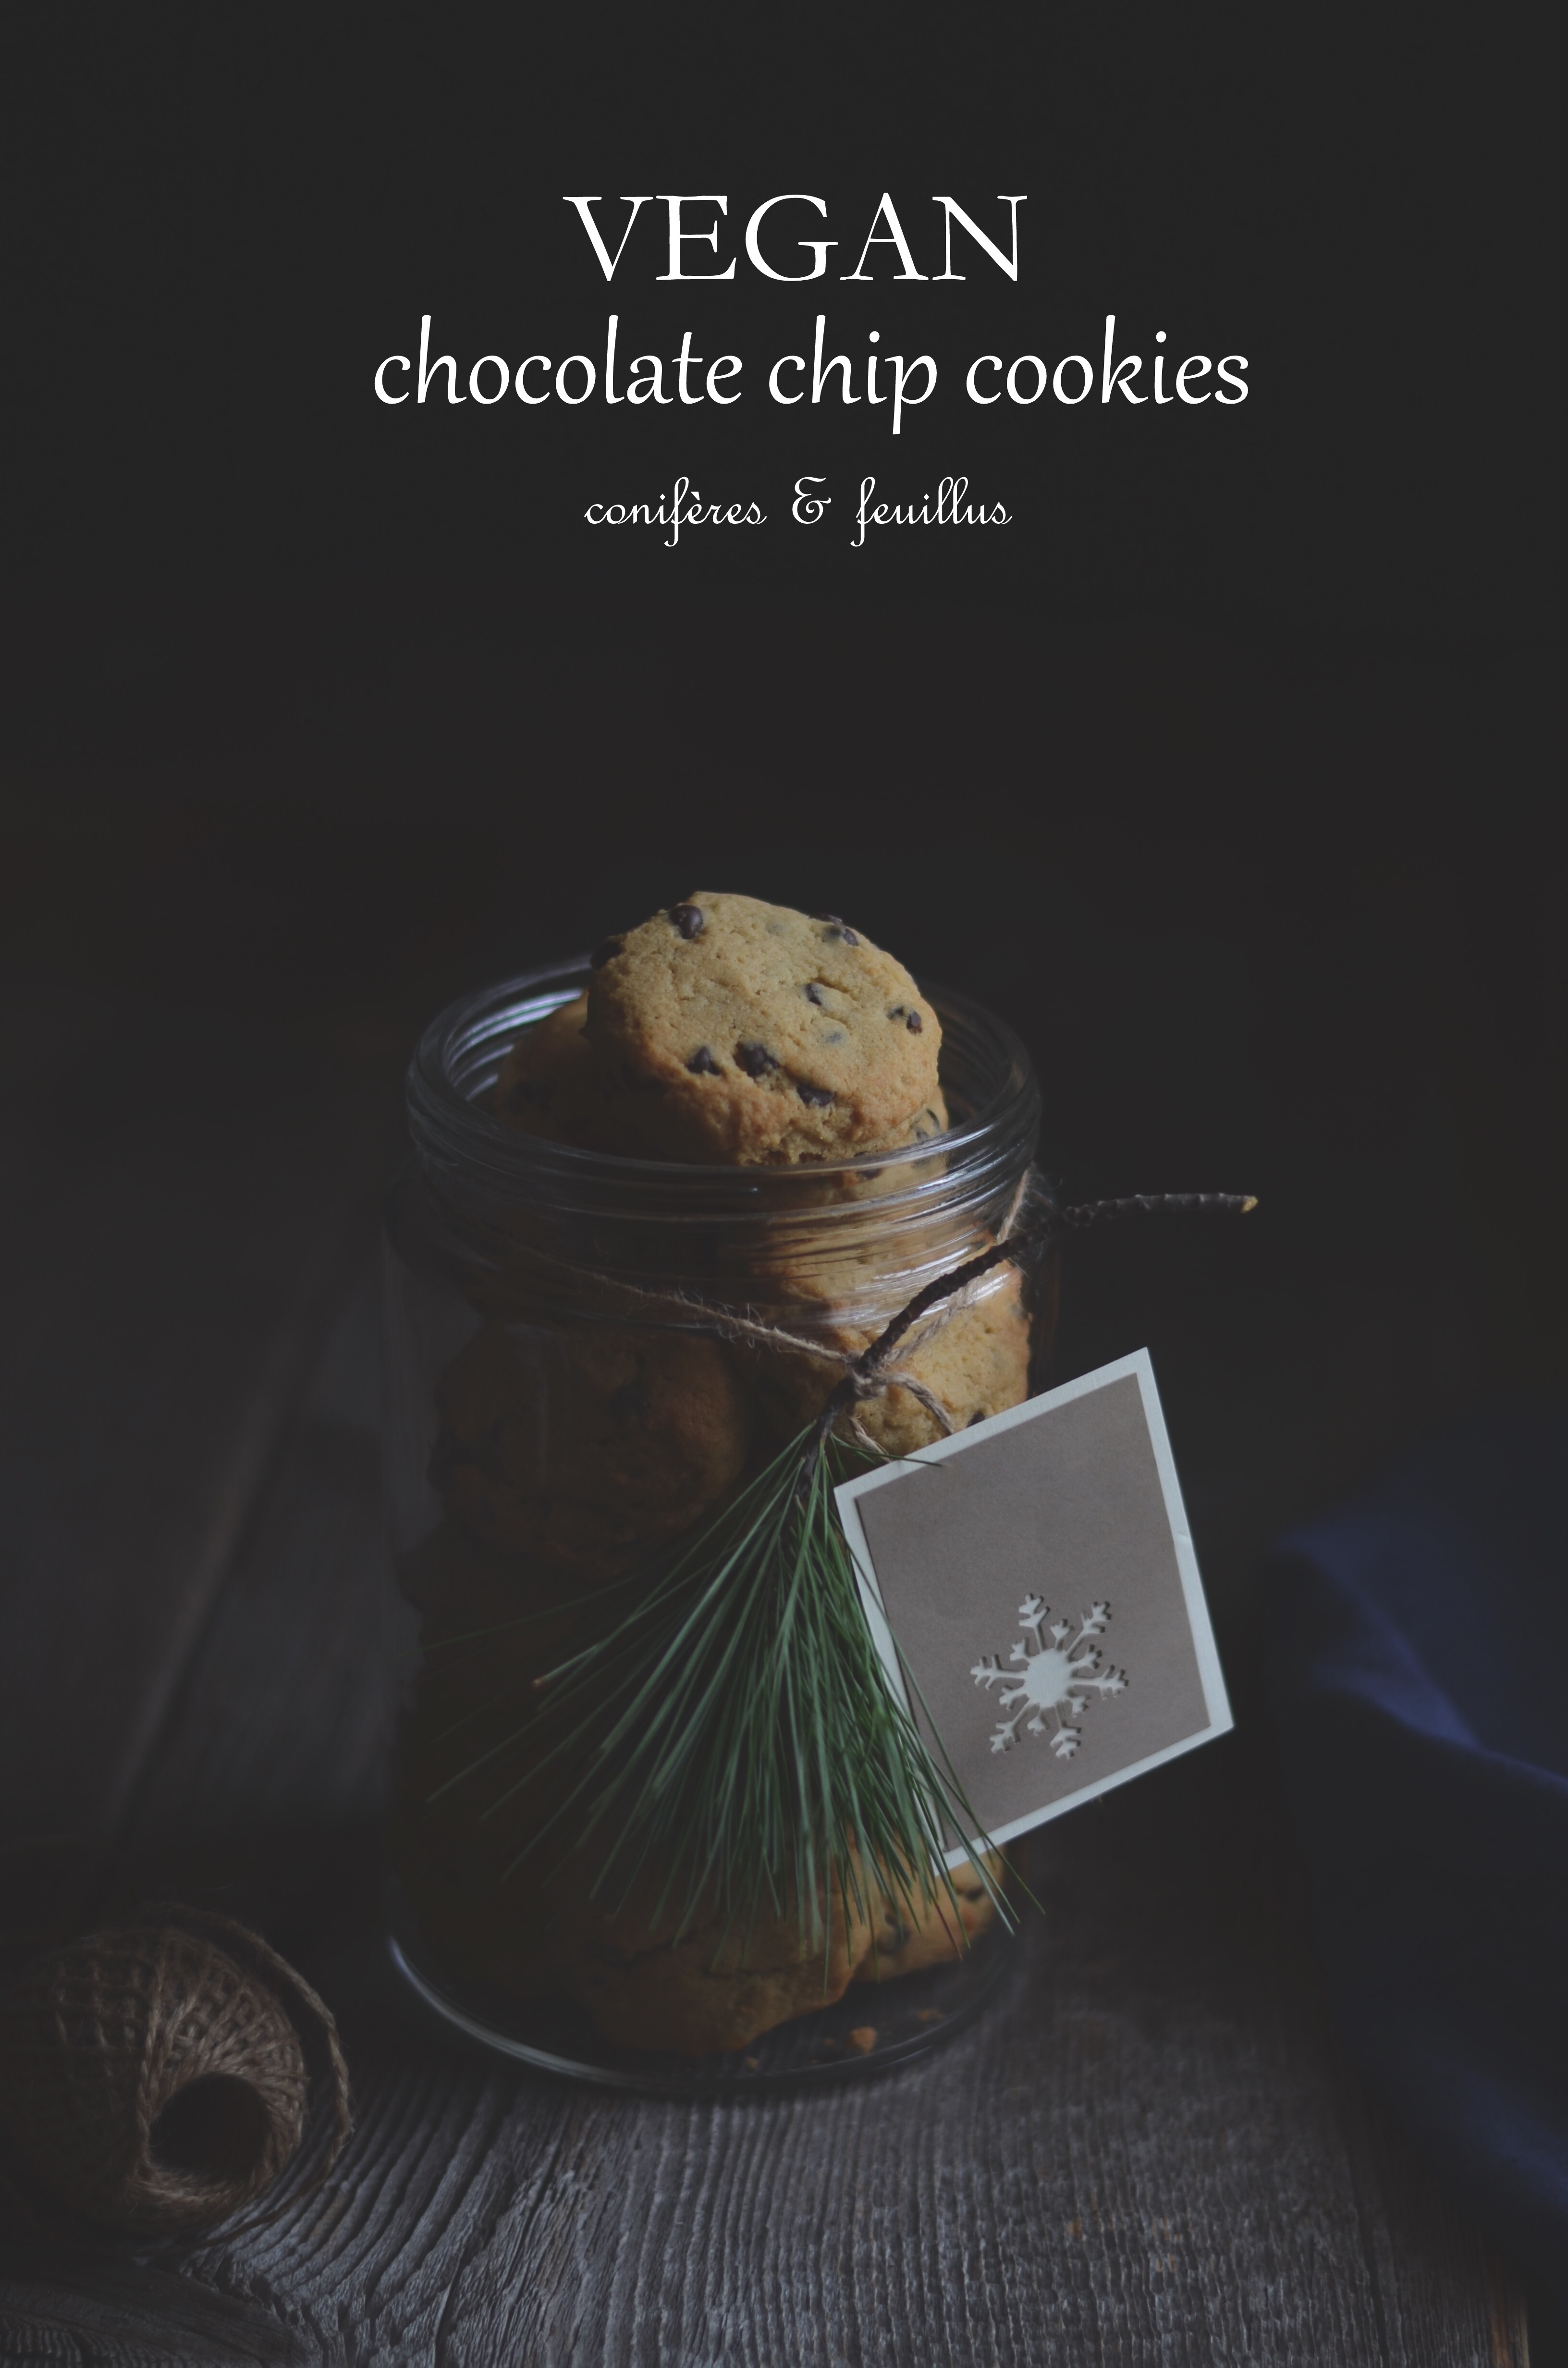 Vegan chocolate chip cookies | conifères & feuillus